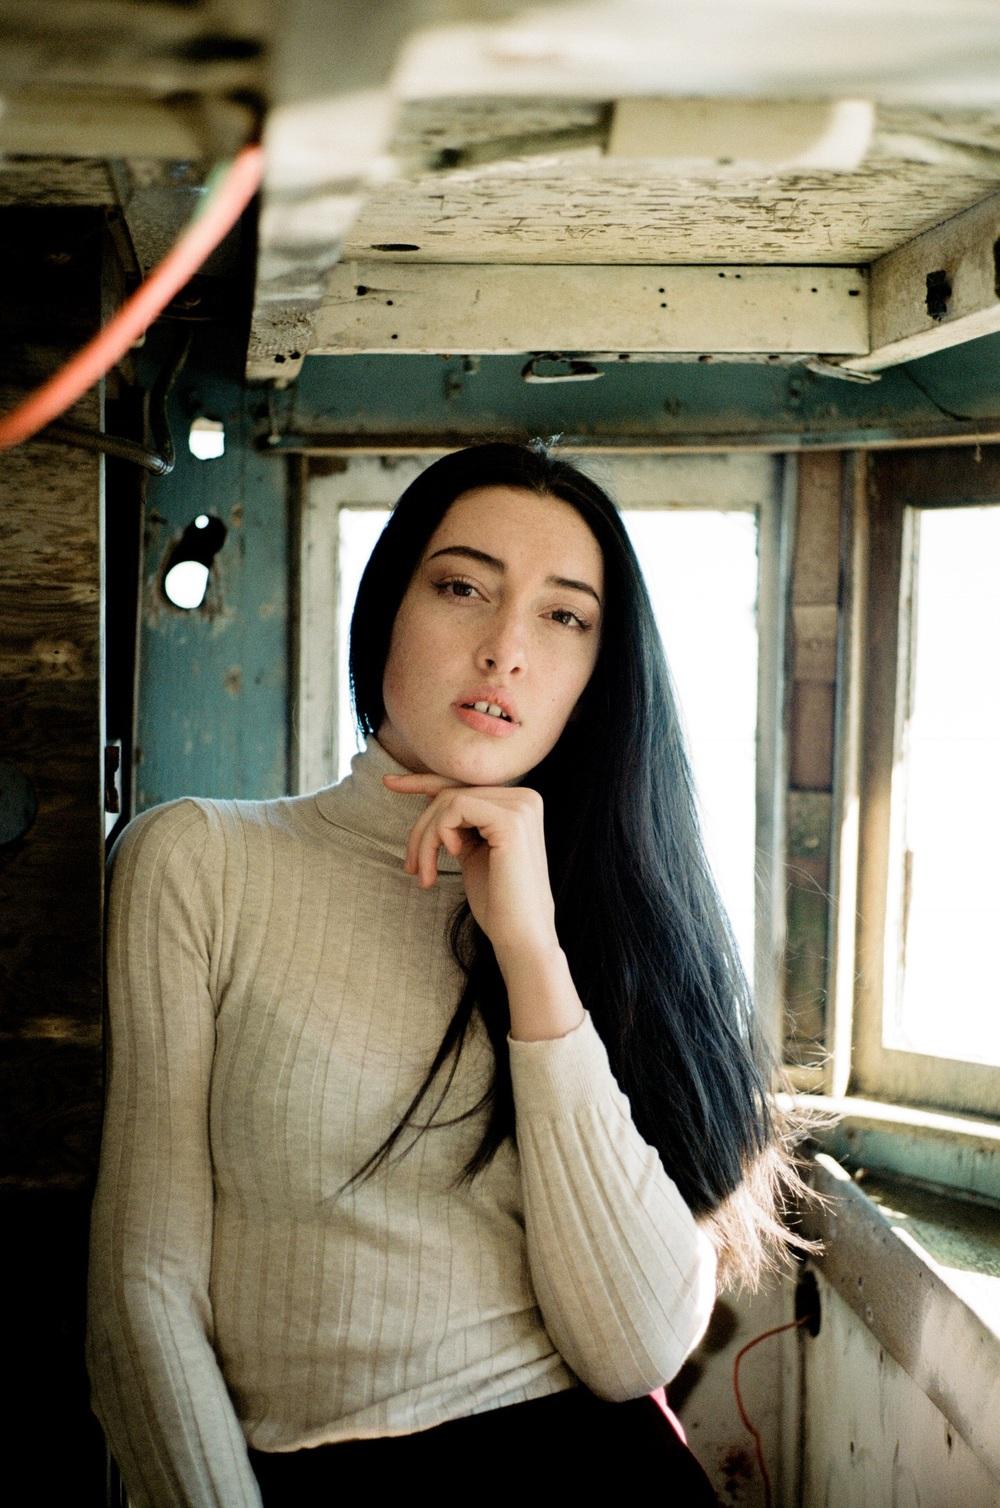 Abby Vansteenberghe